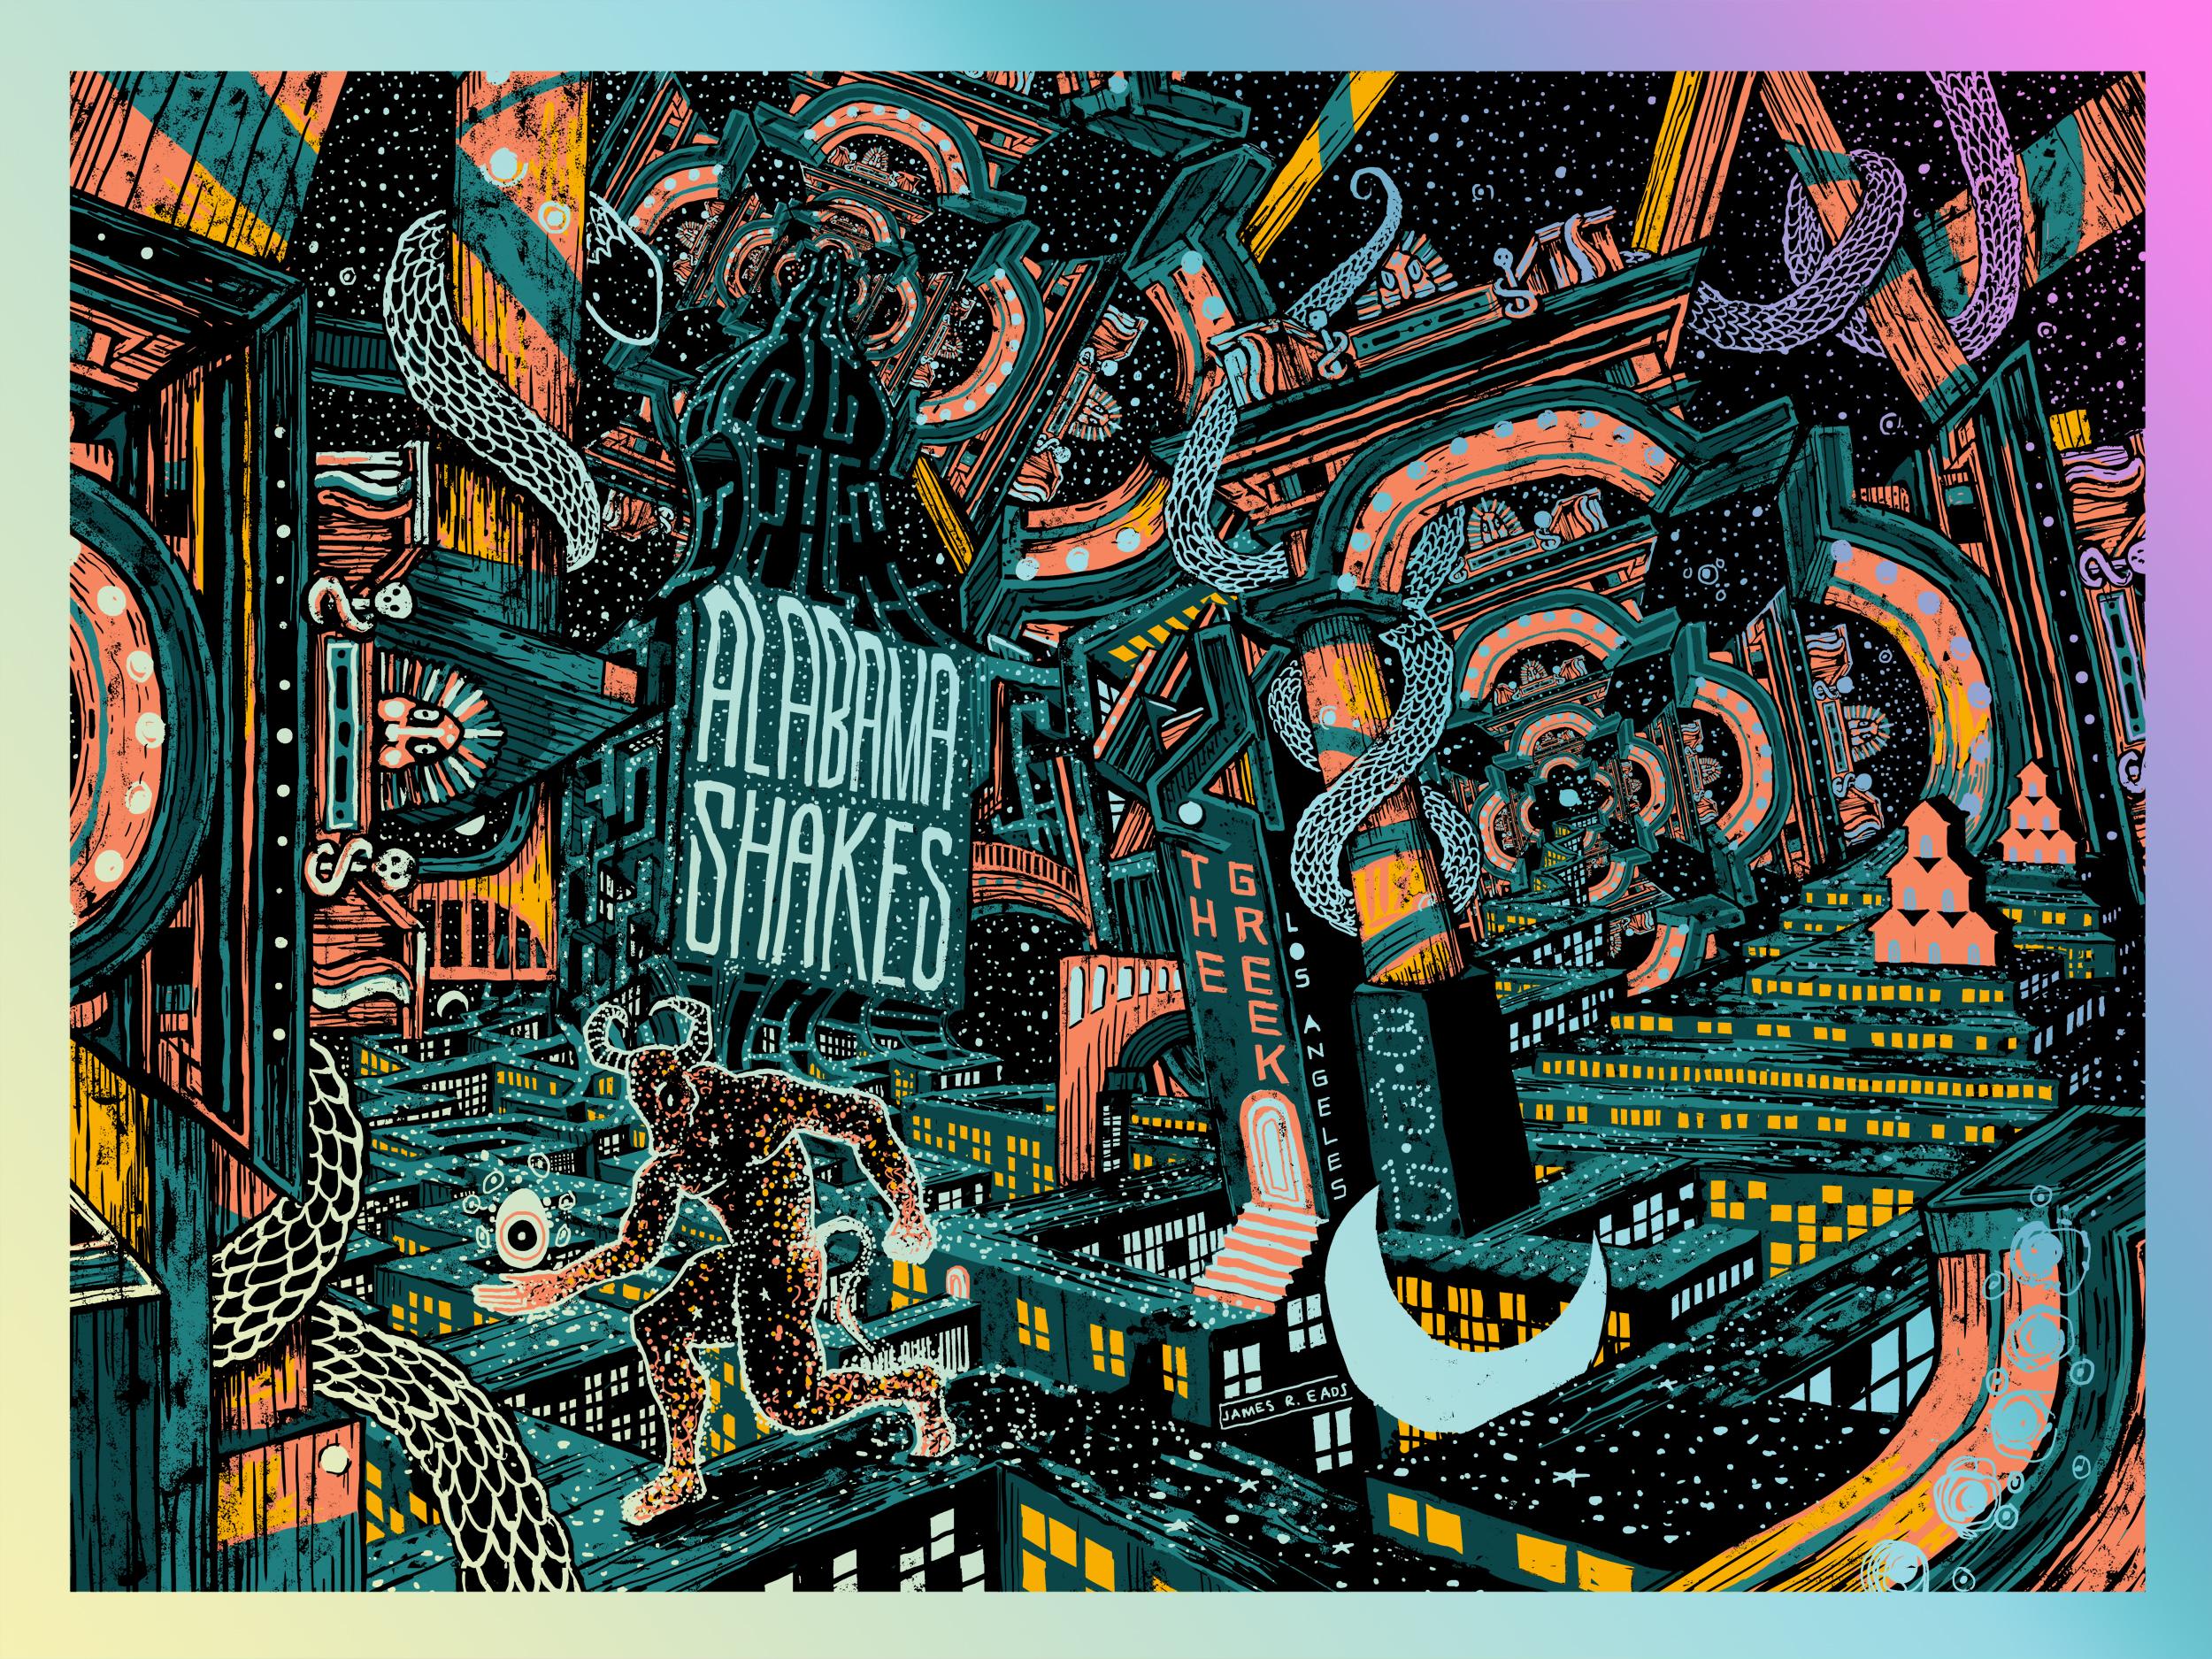 Alabama Shakes Tour Poster